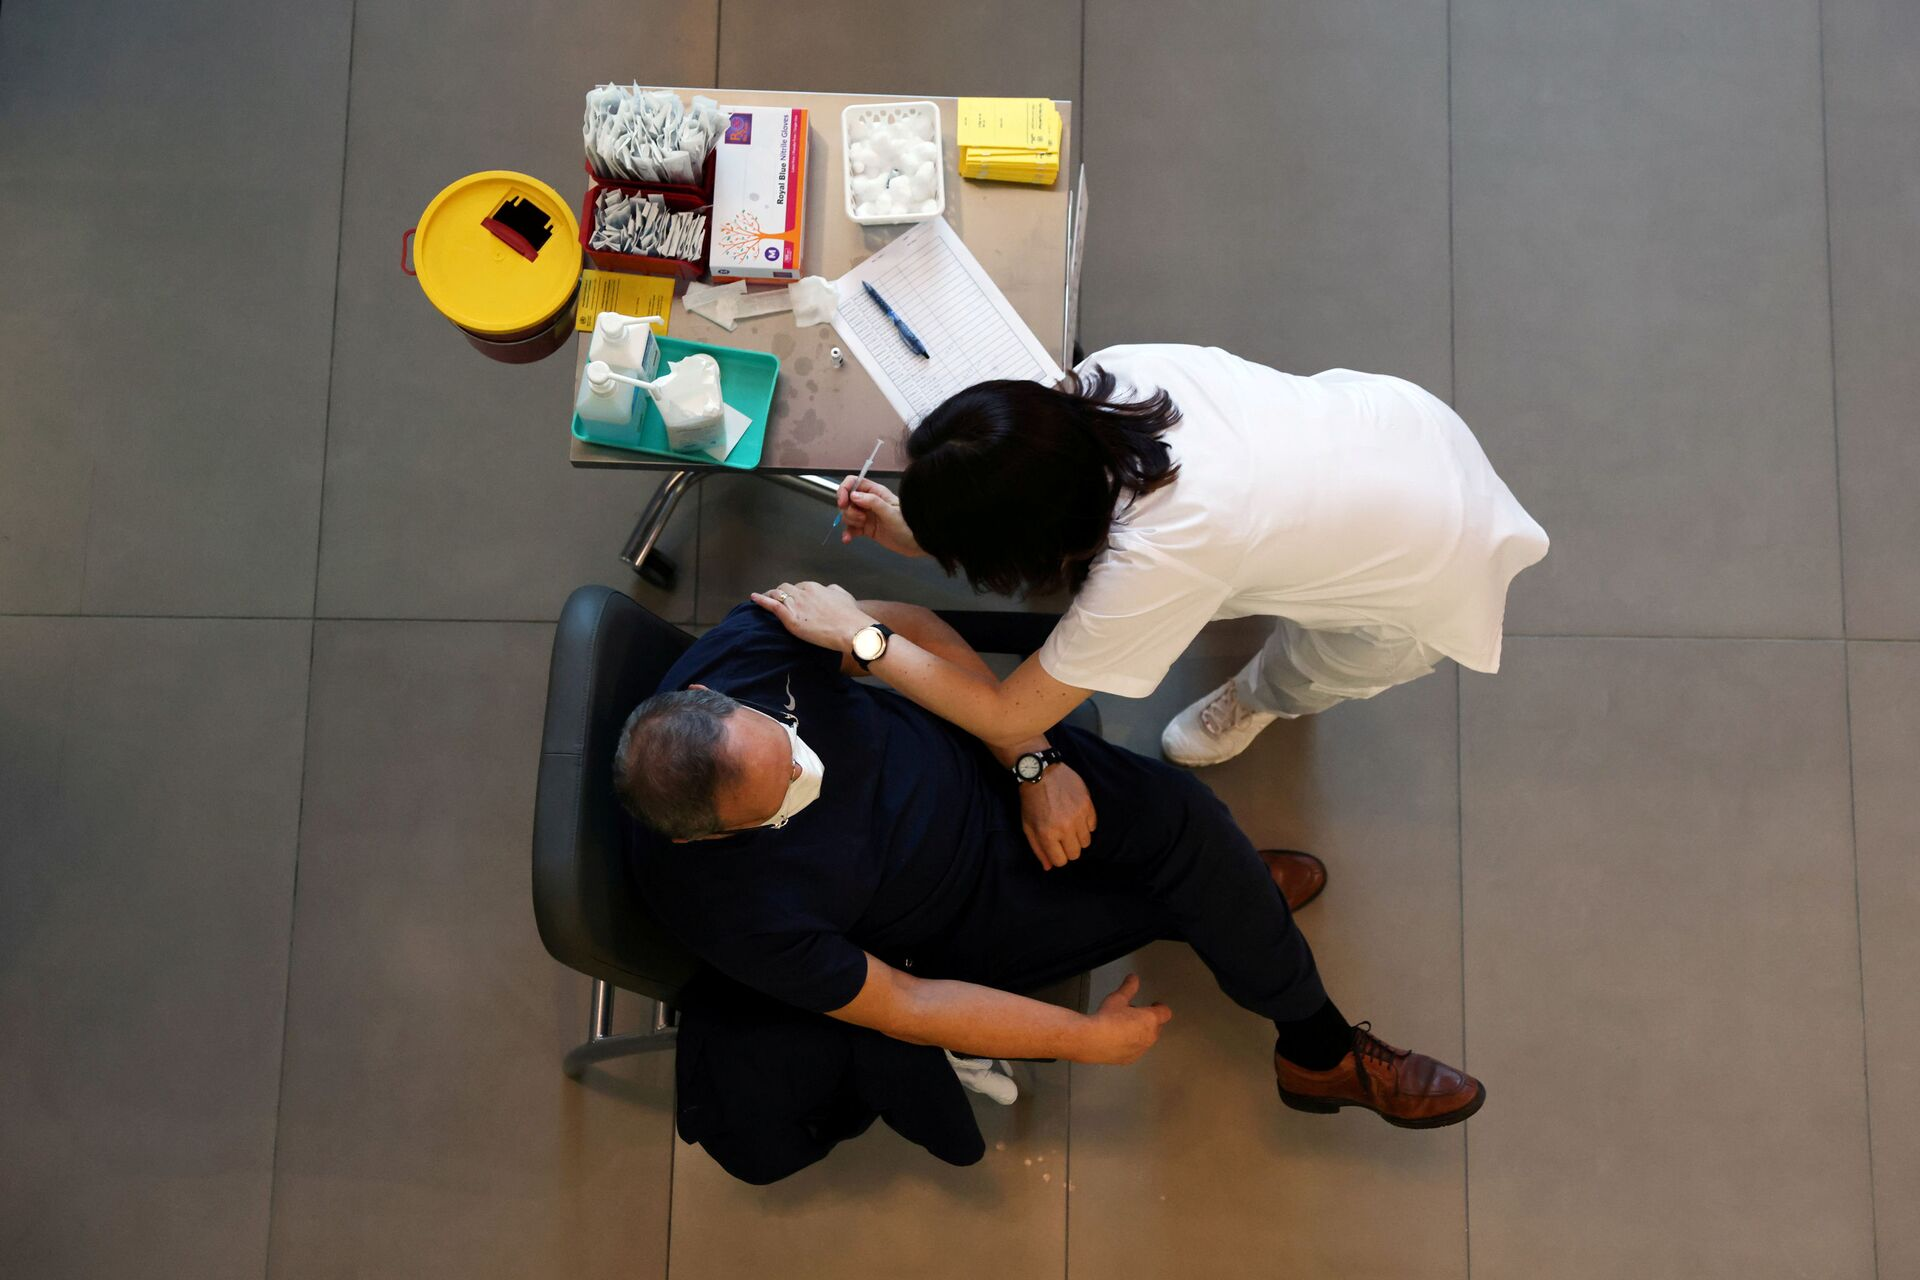 A medical worker vaccinates a man against the coronavirus disease (COVID-19) as Israel kicks off a coronavirus vaccination drive, at Tel Aviv Sourasky Medical Center (Ichilov Hospital) in Tel Aviv, Israel December 20, 2020 - Sputnik International, 1920, 07.09.2021